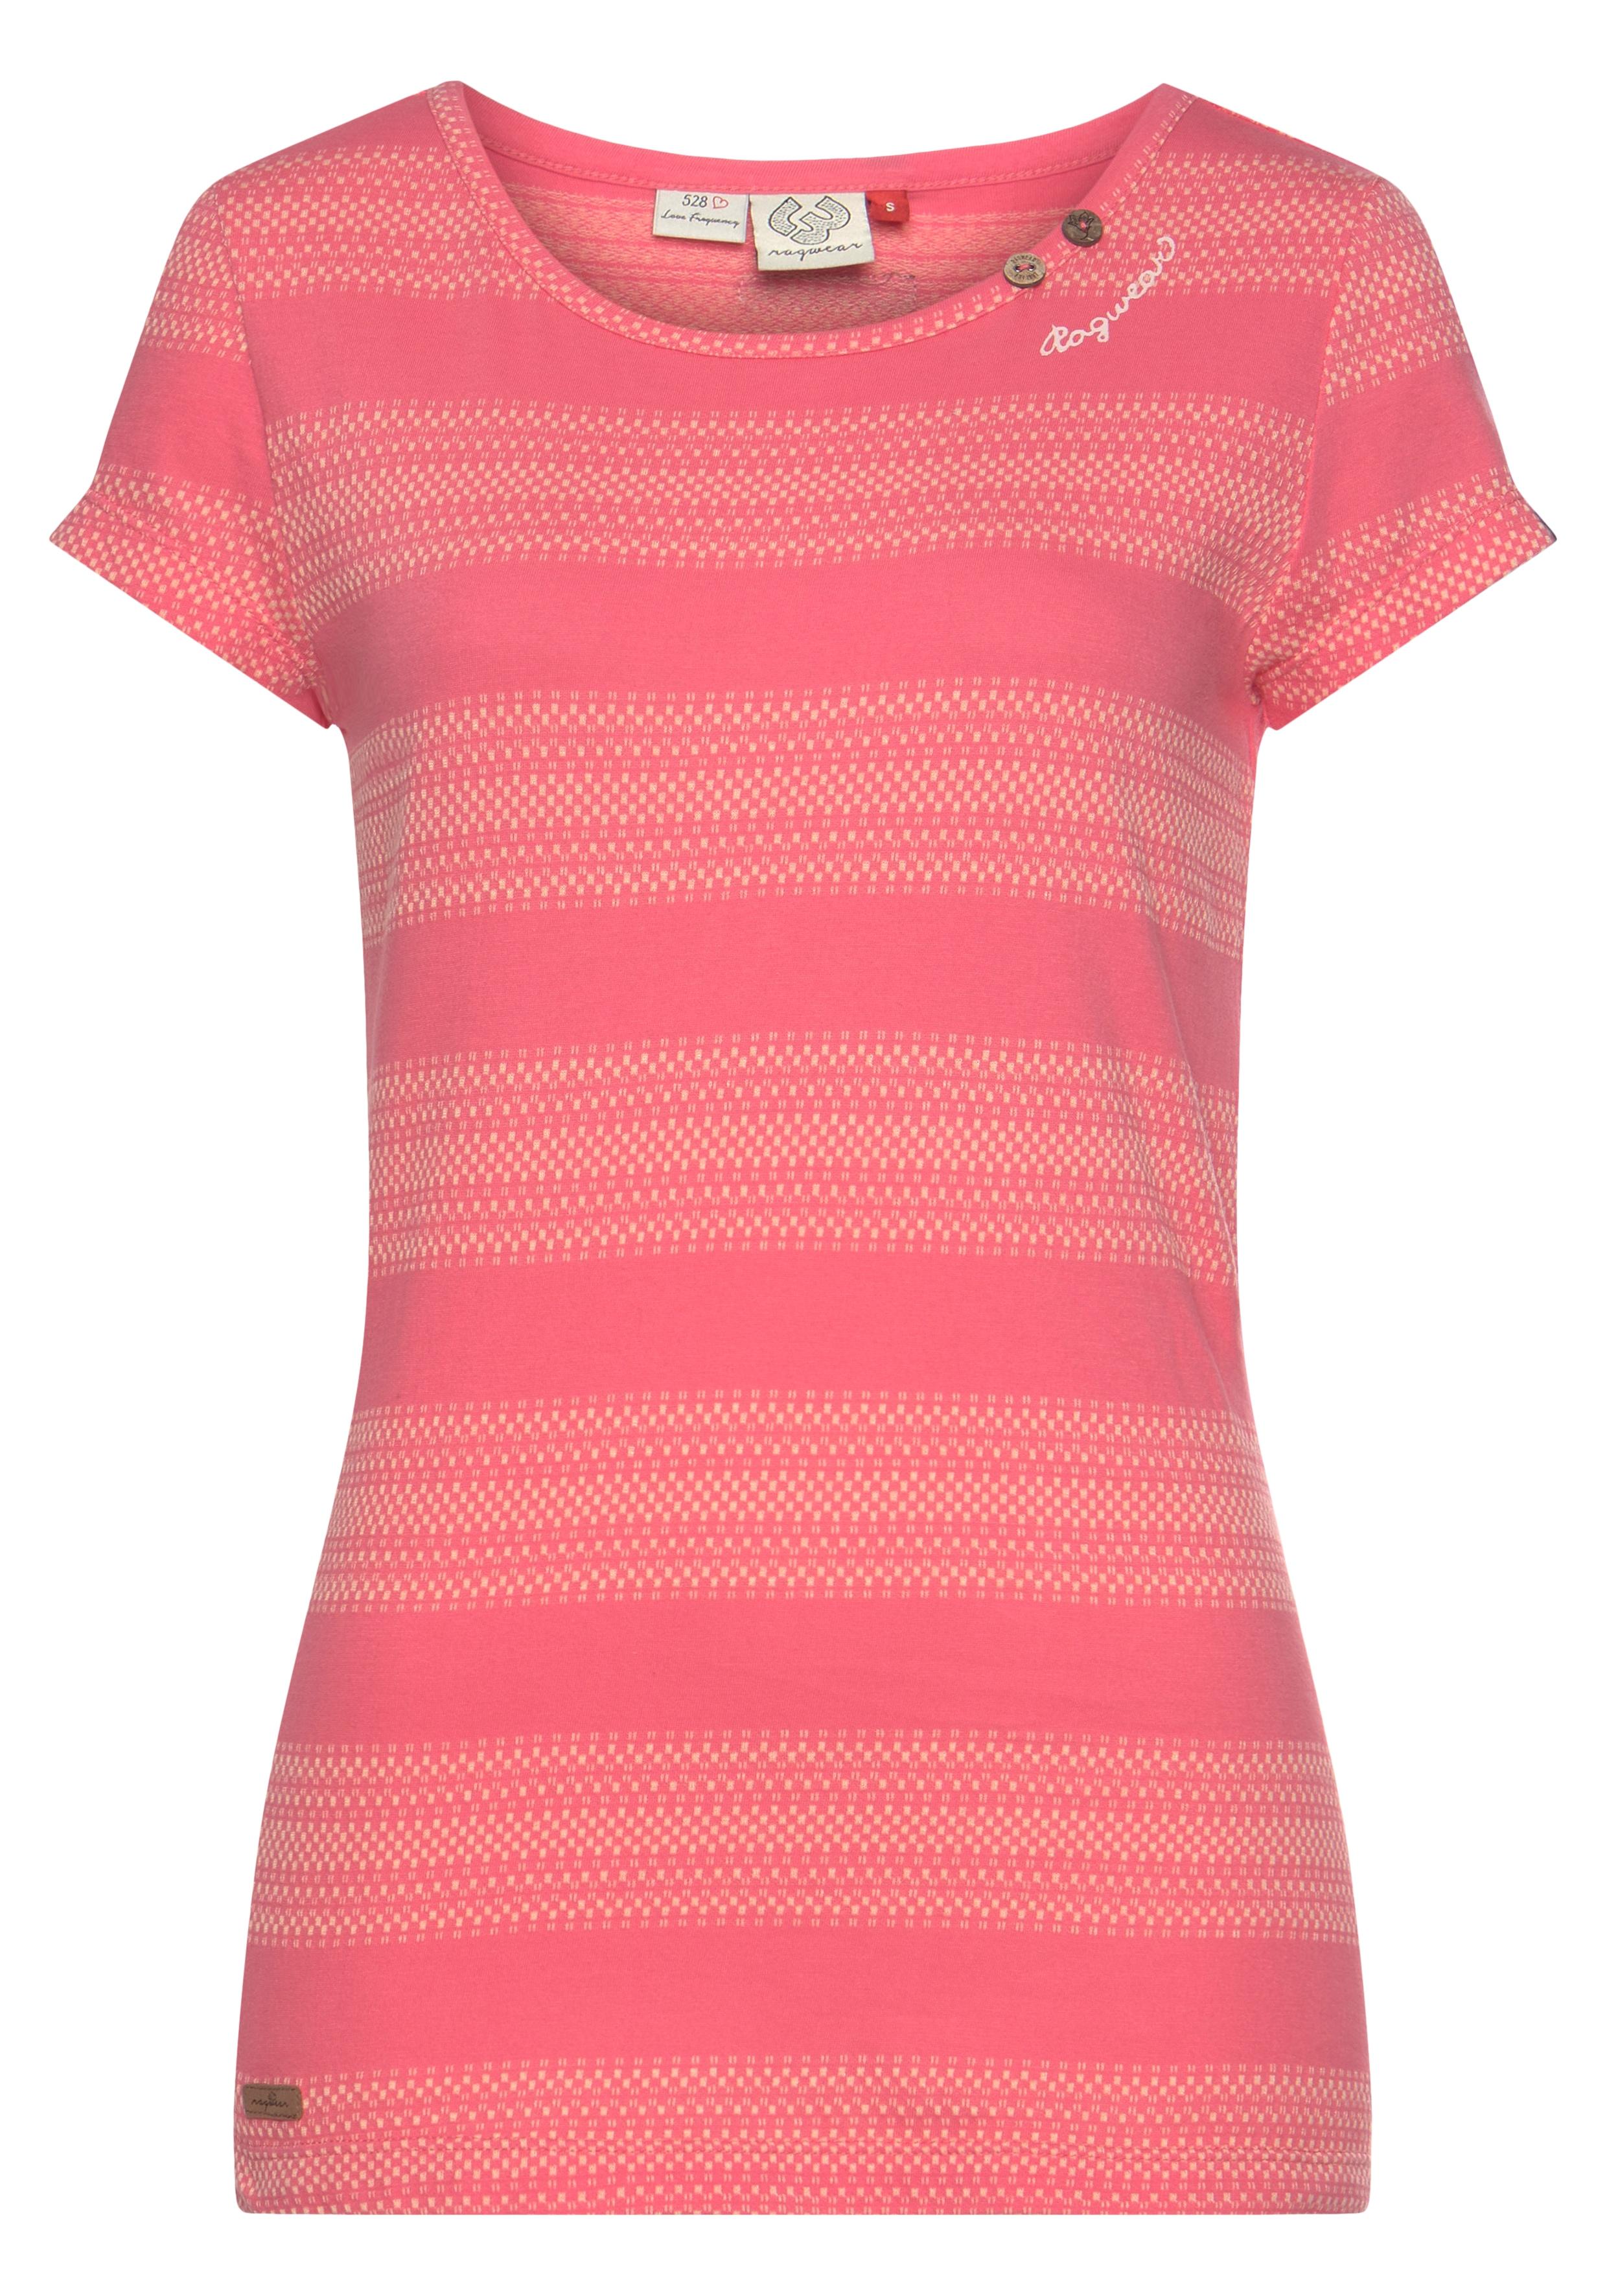 ragwear -  T-Shirt METE, im Blockstreifen-Design